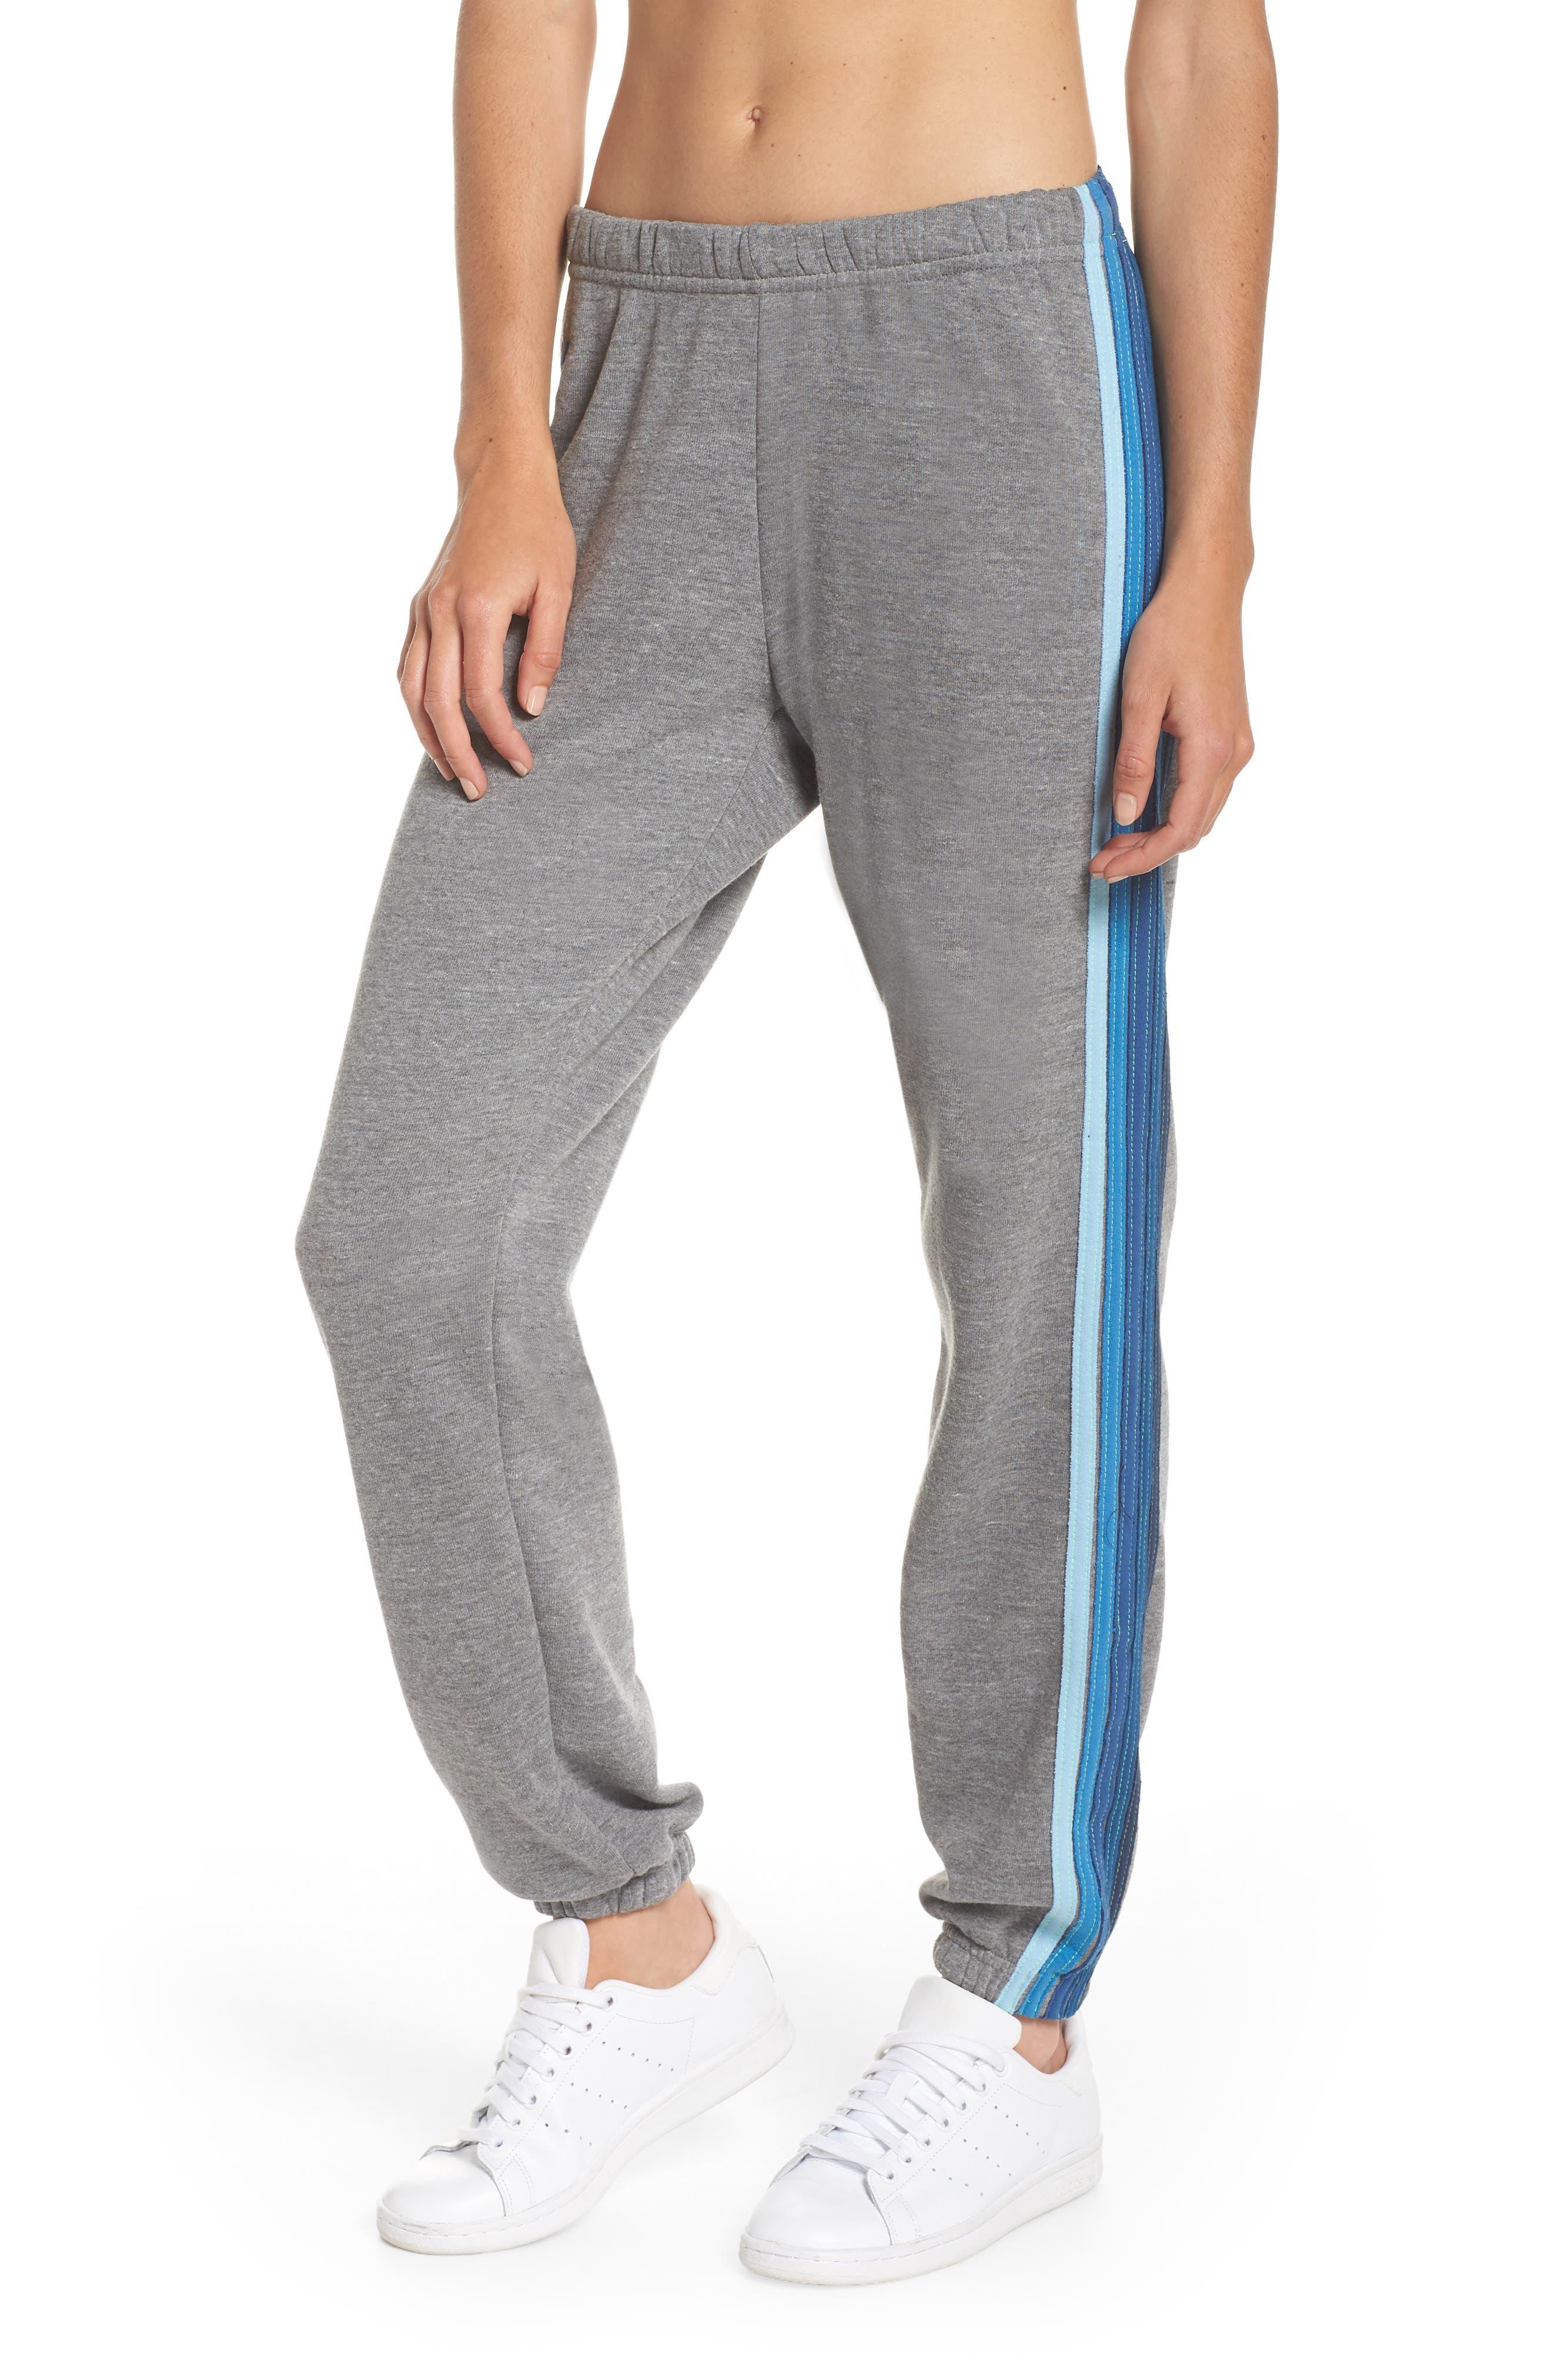 Stripe Sweatpants,                             Main thumbnail 1, color,                             Heather Grey/ Blue Stripes